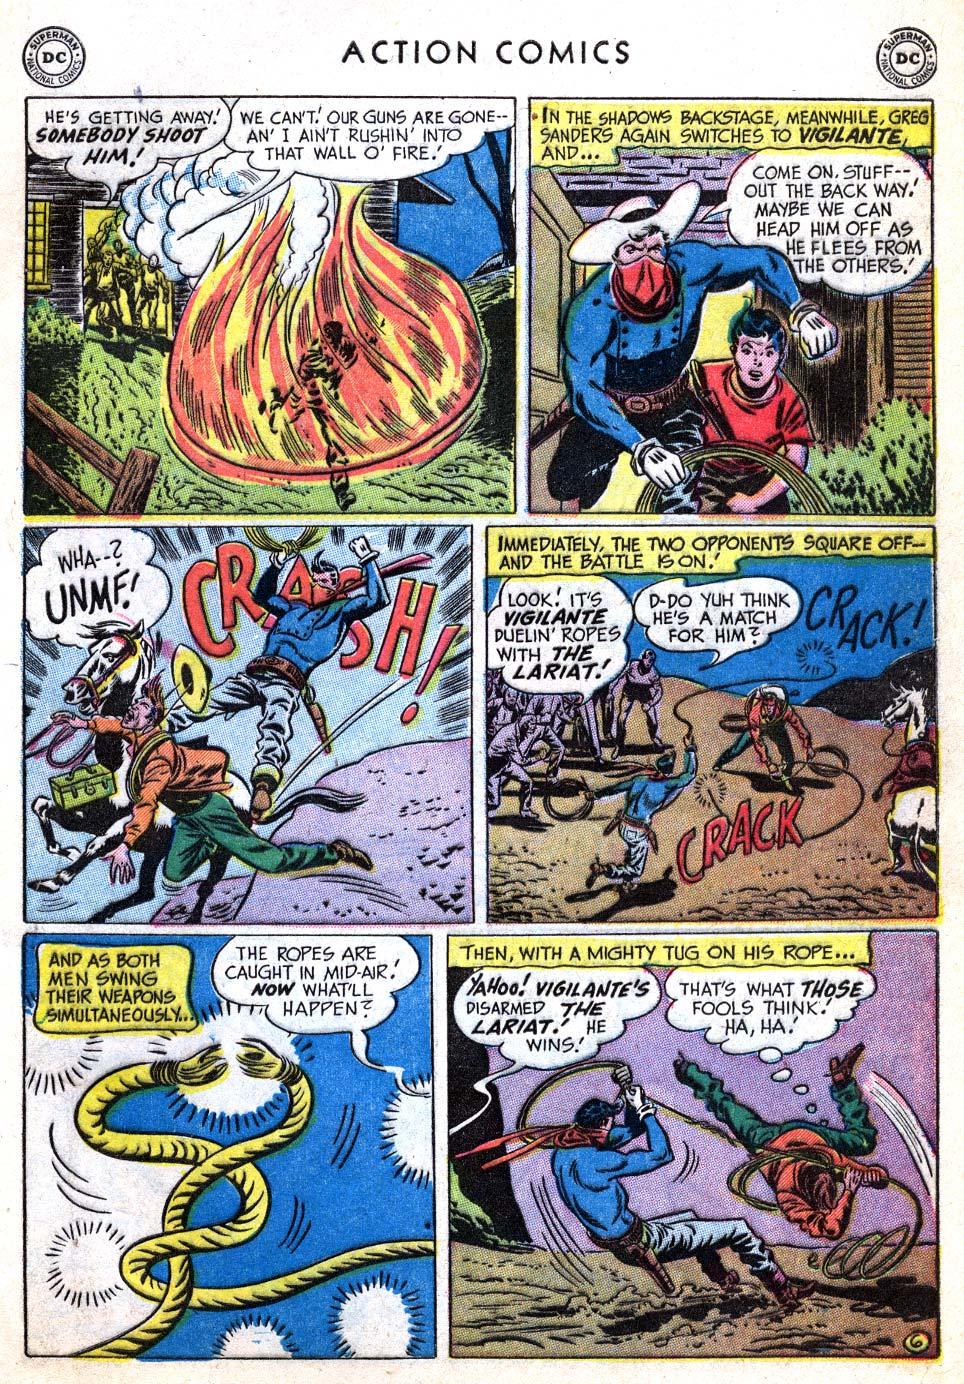 Action Comics (1938) 182 Page 38